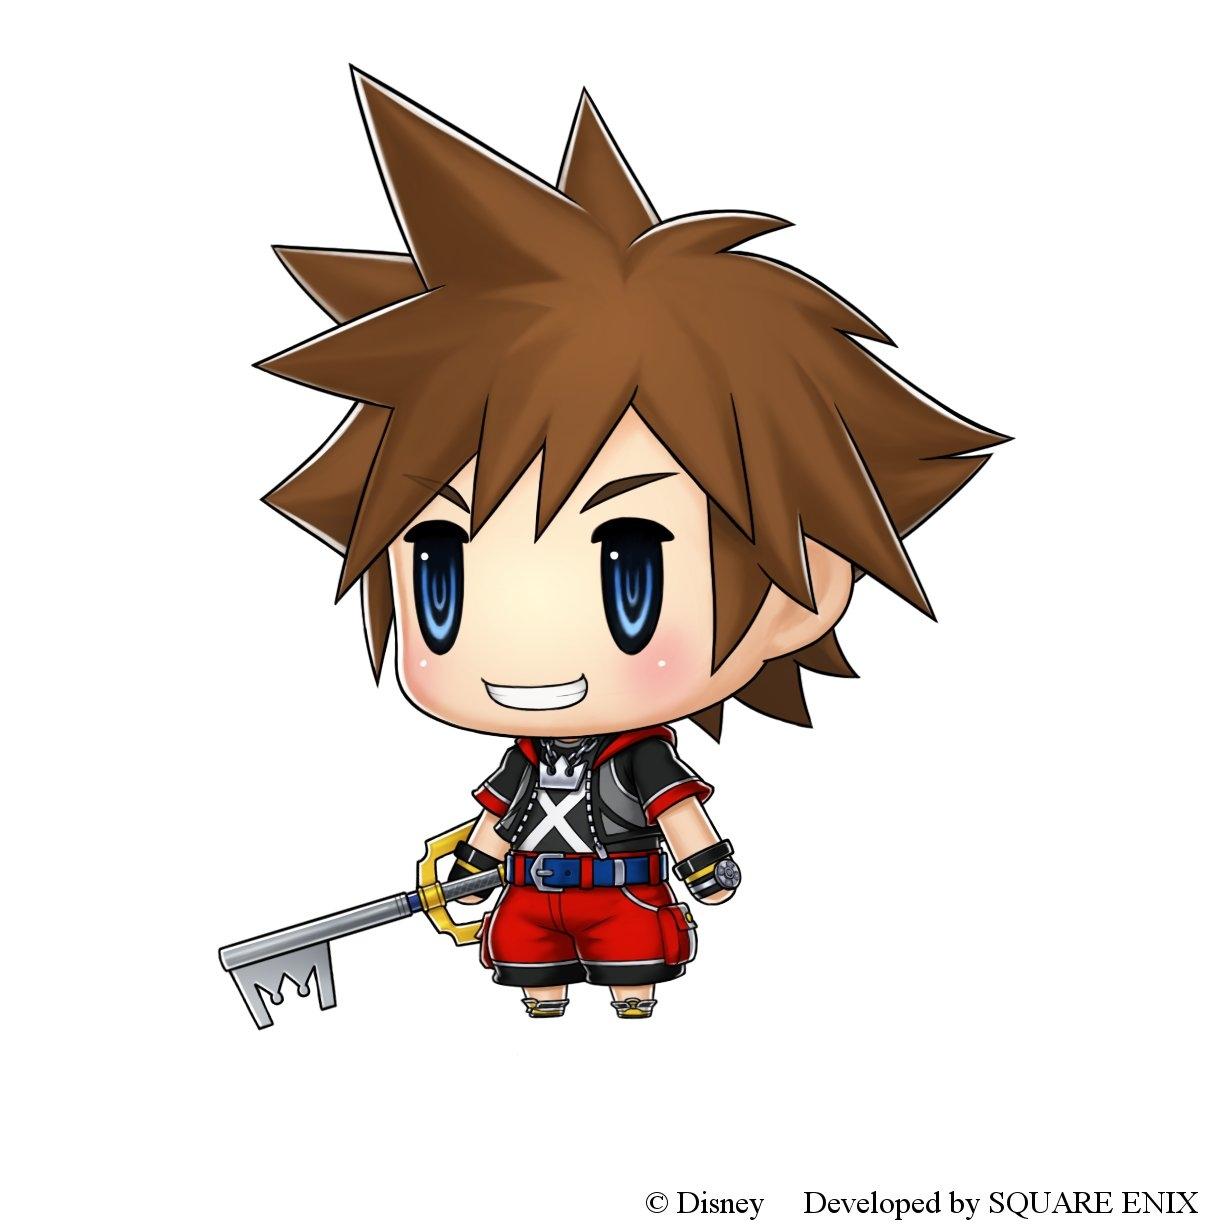 Sora in World of Final Fantasy